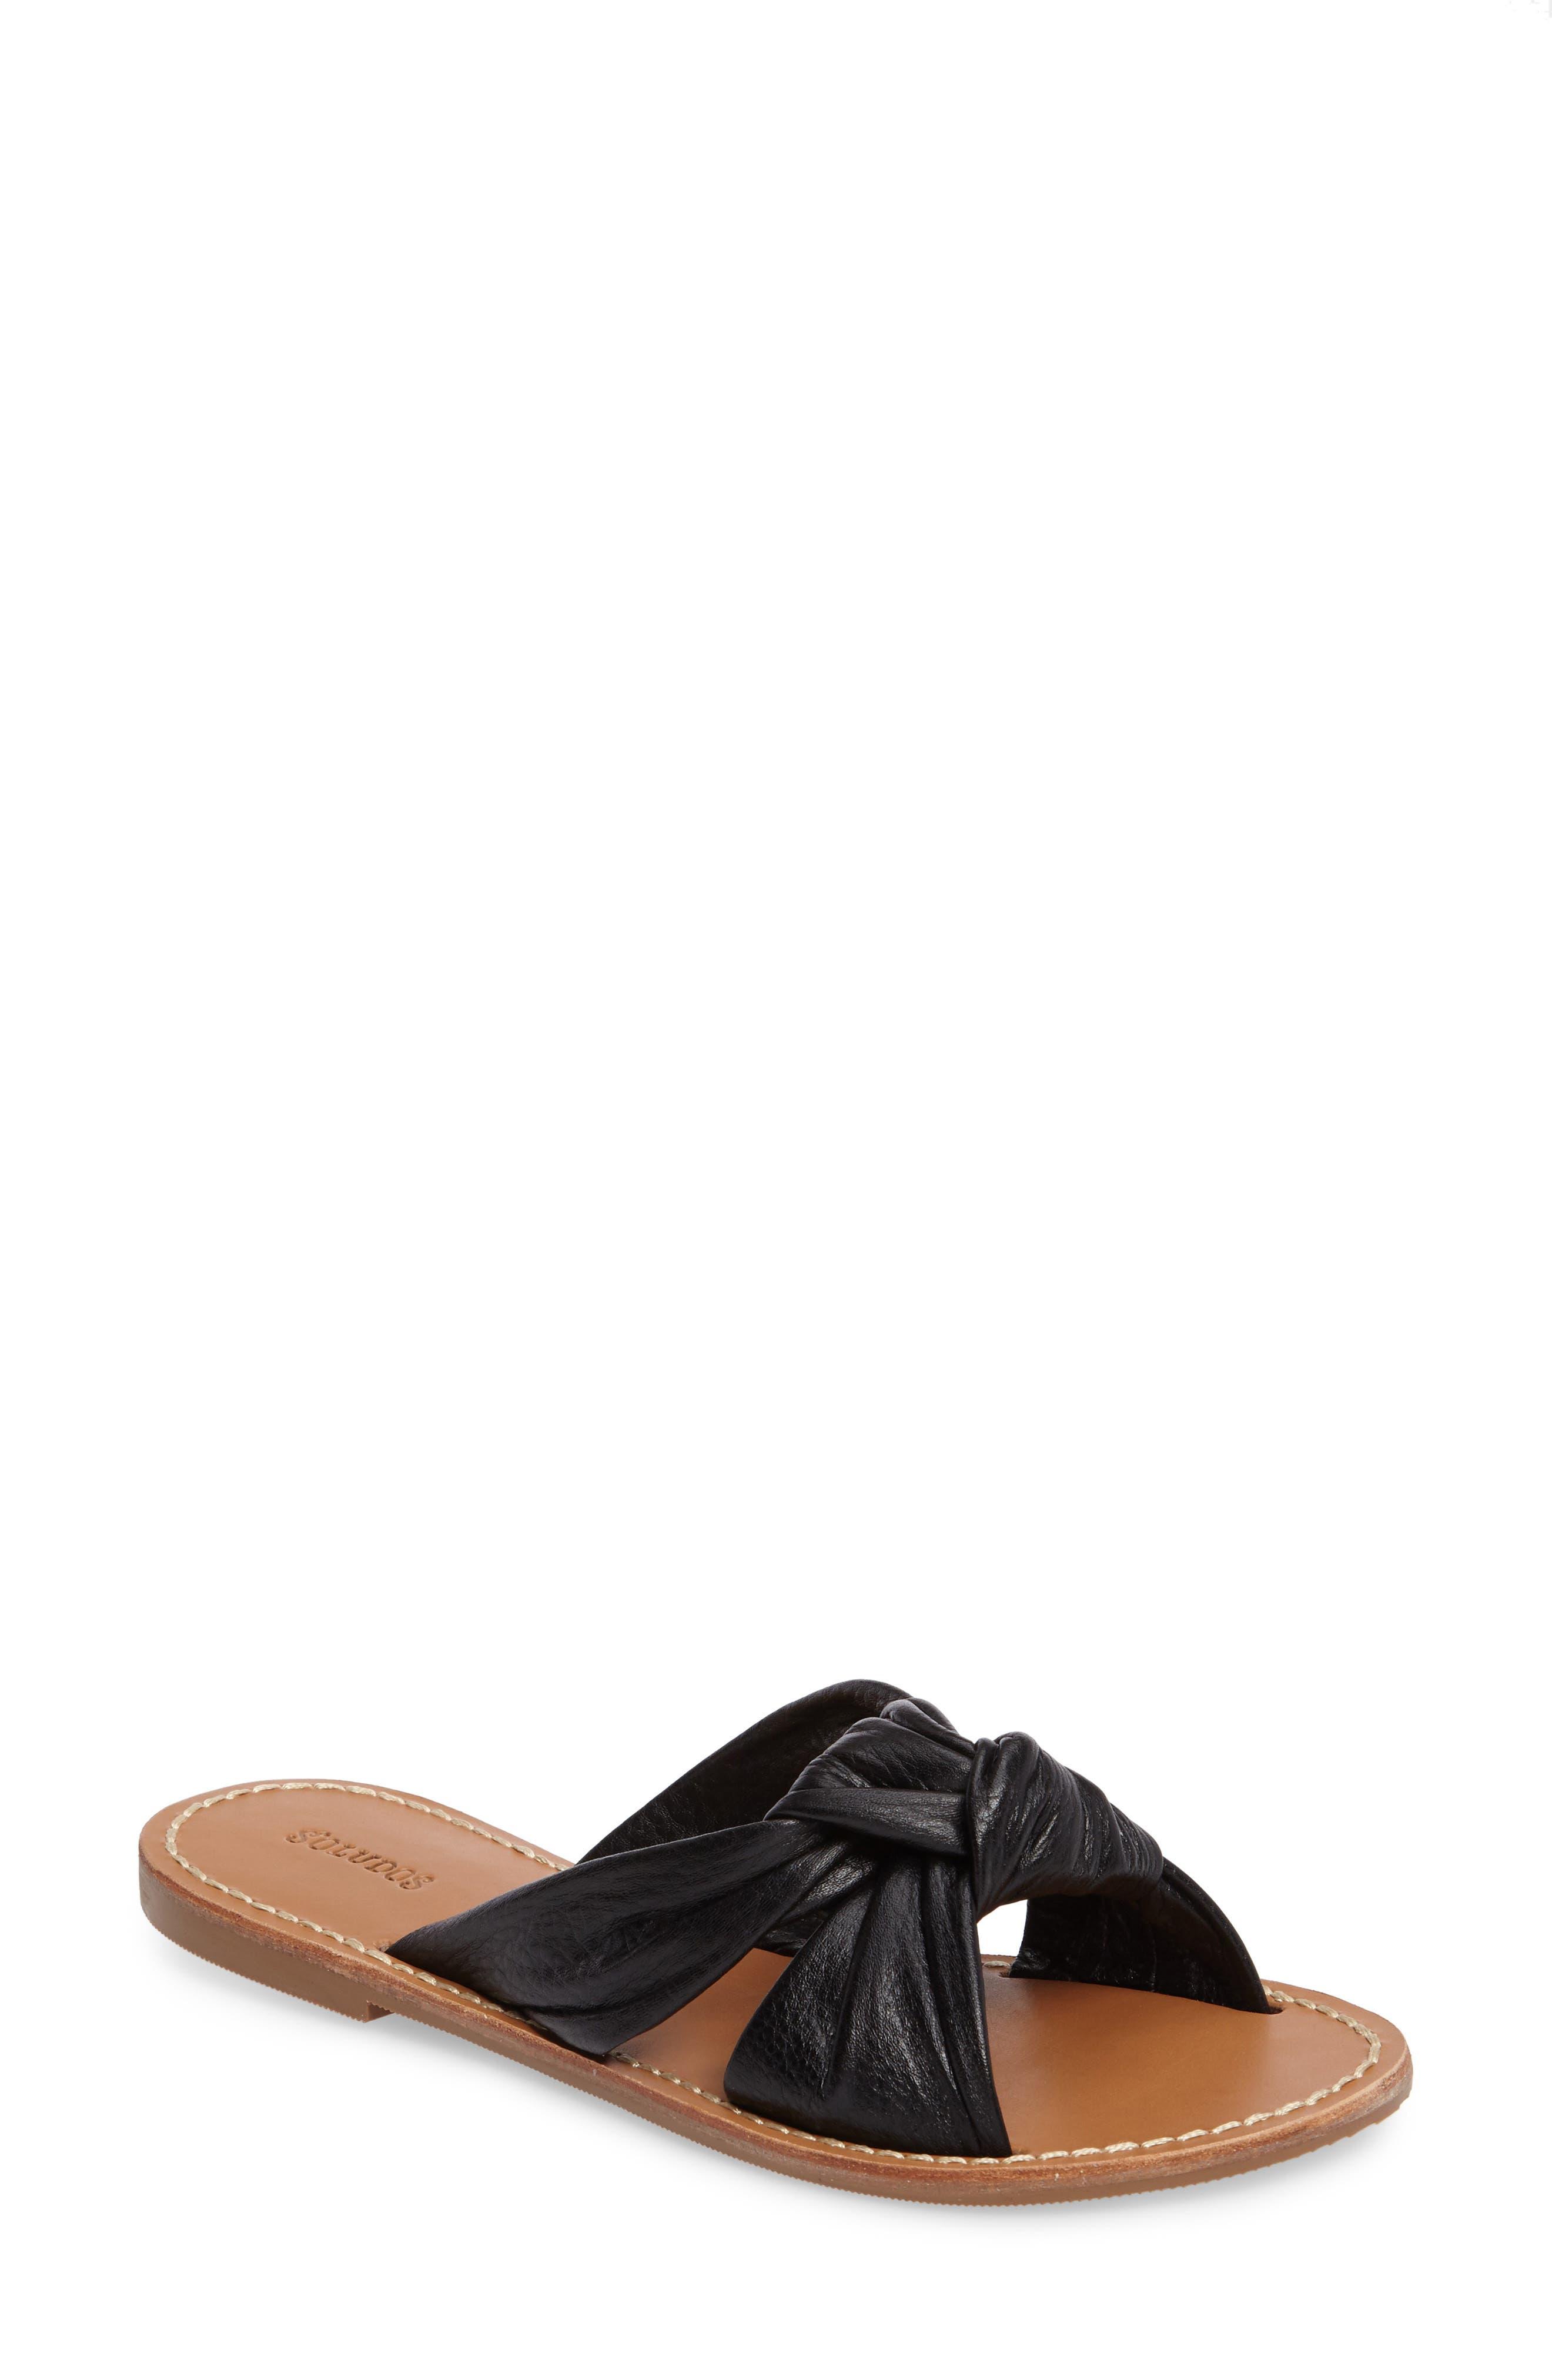 Main Image - Soludos Knotted Slide Sandal (Women)